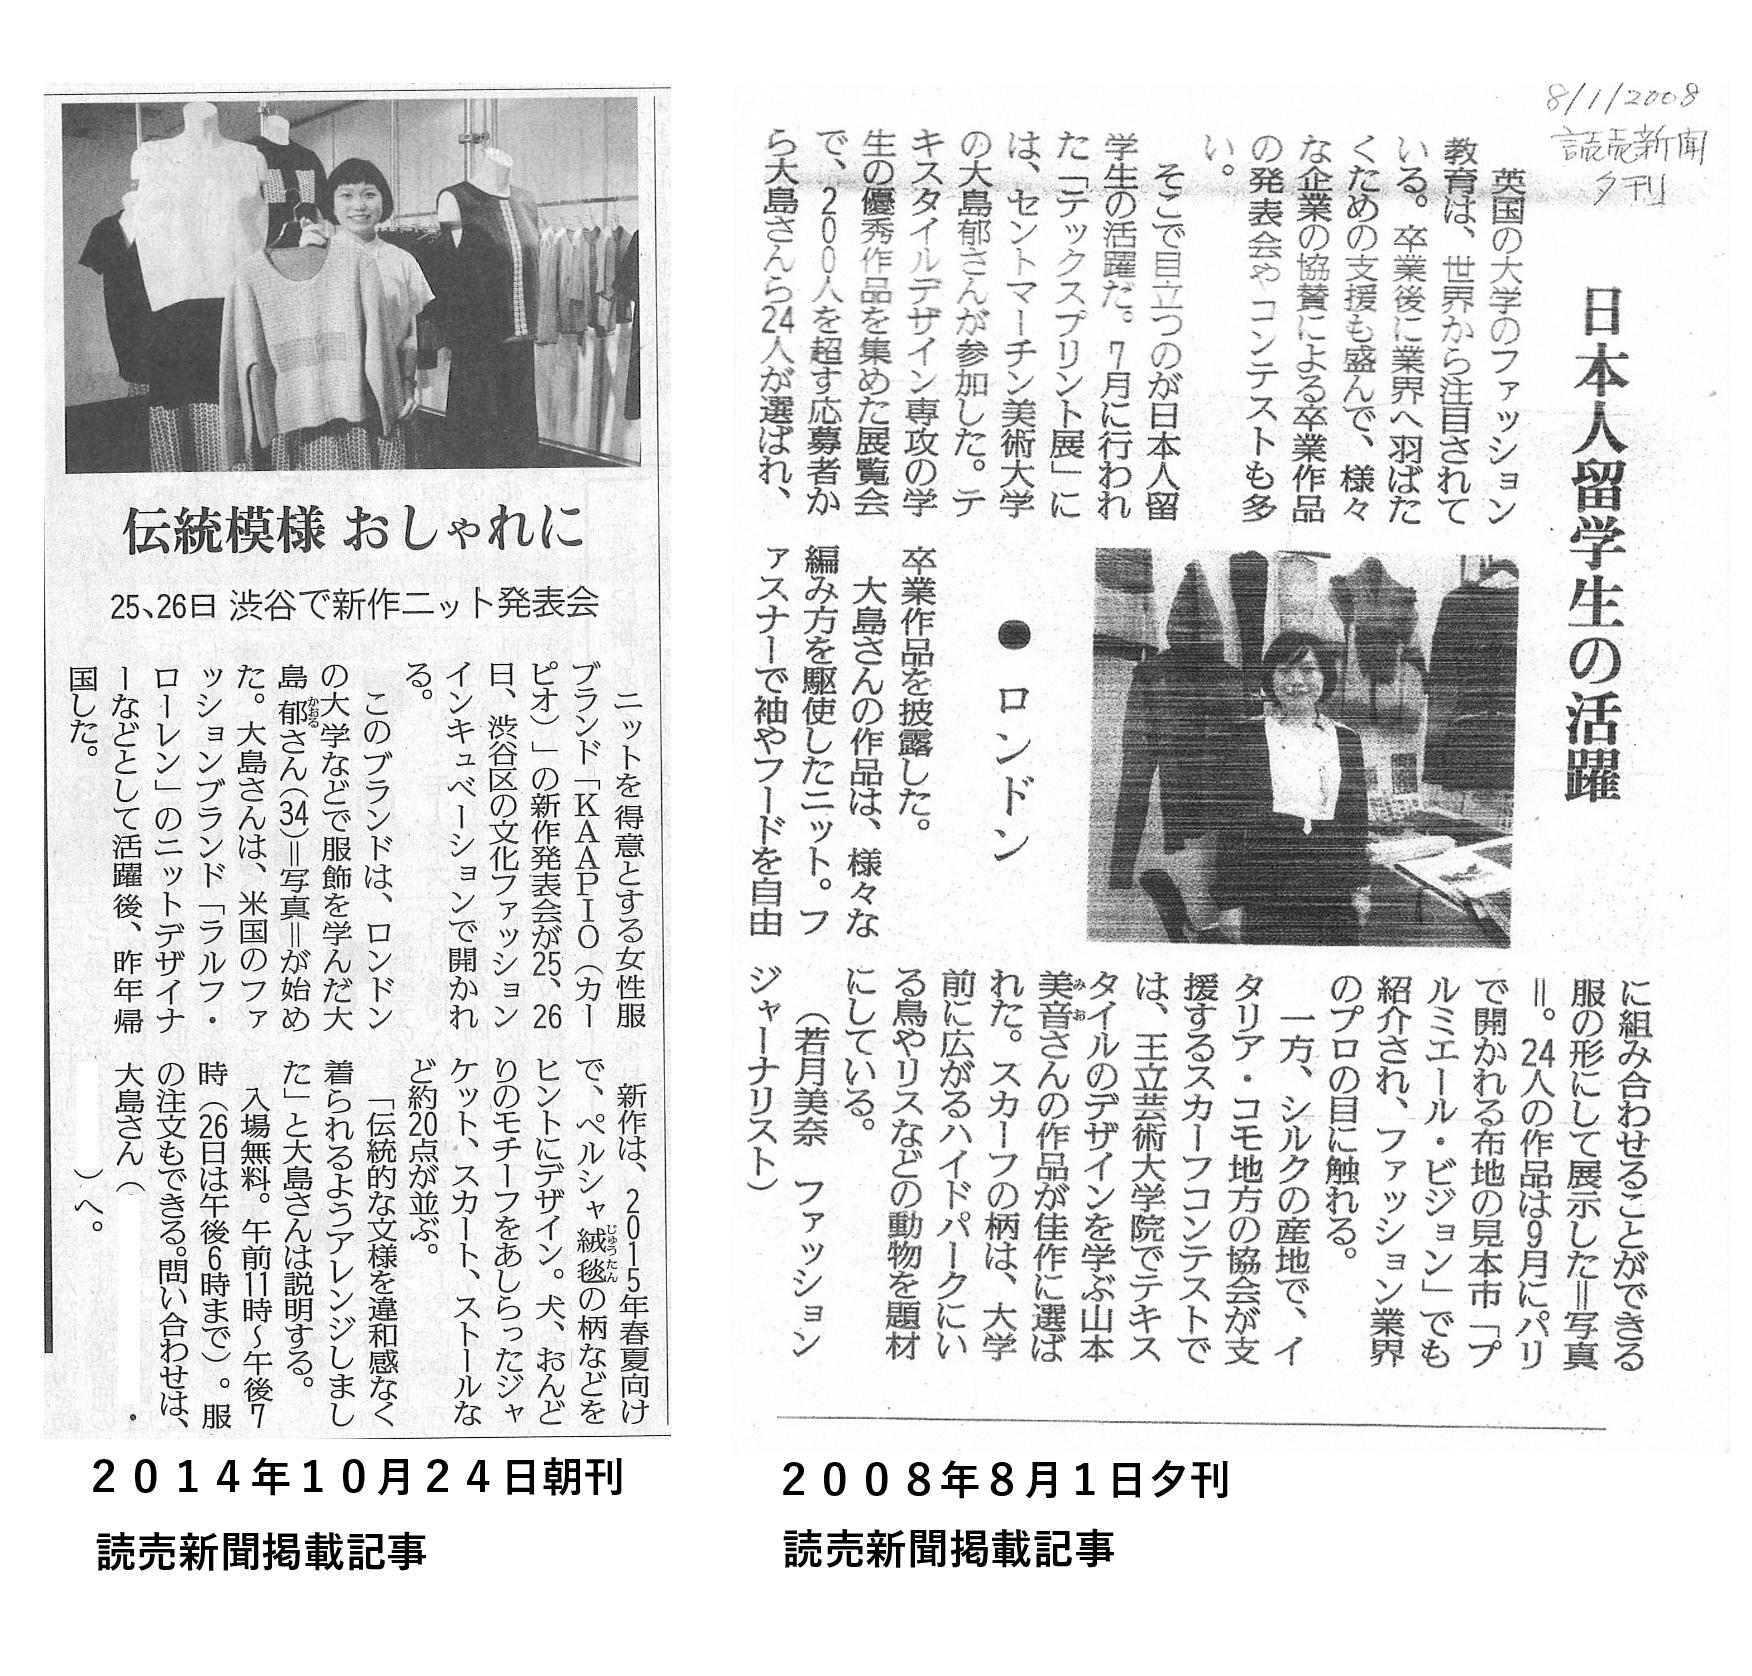 yomiuri_2008_2014